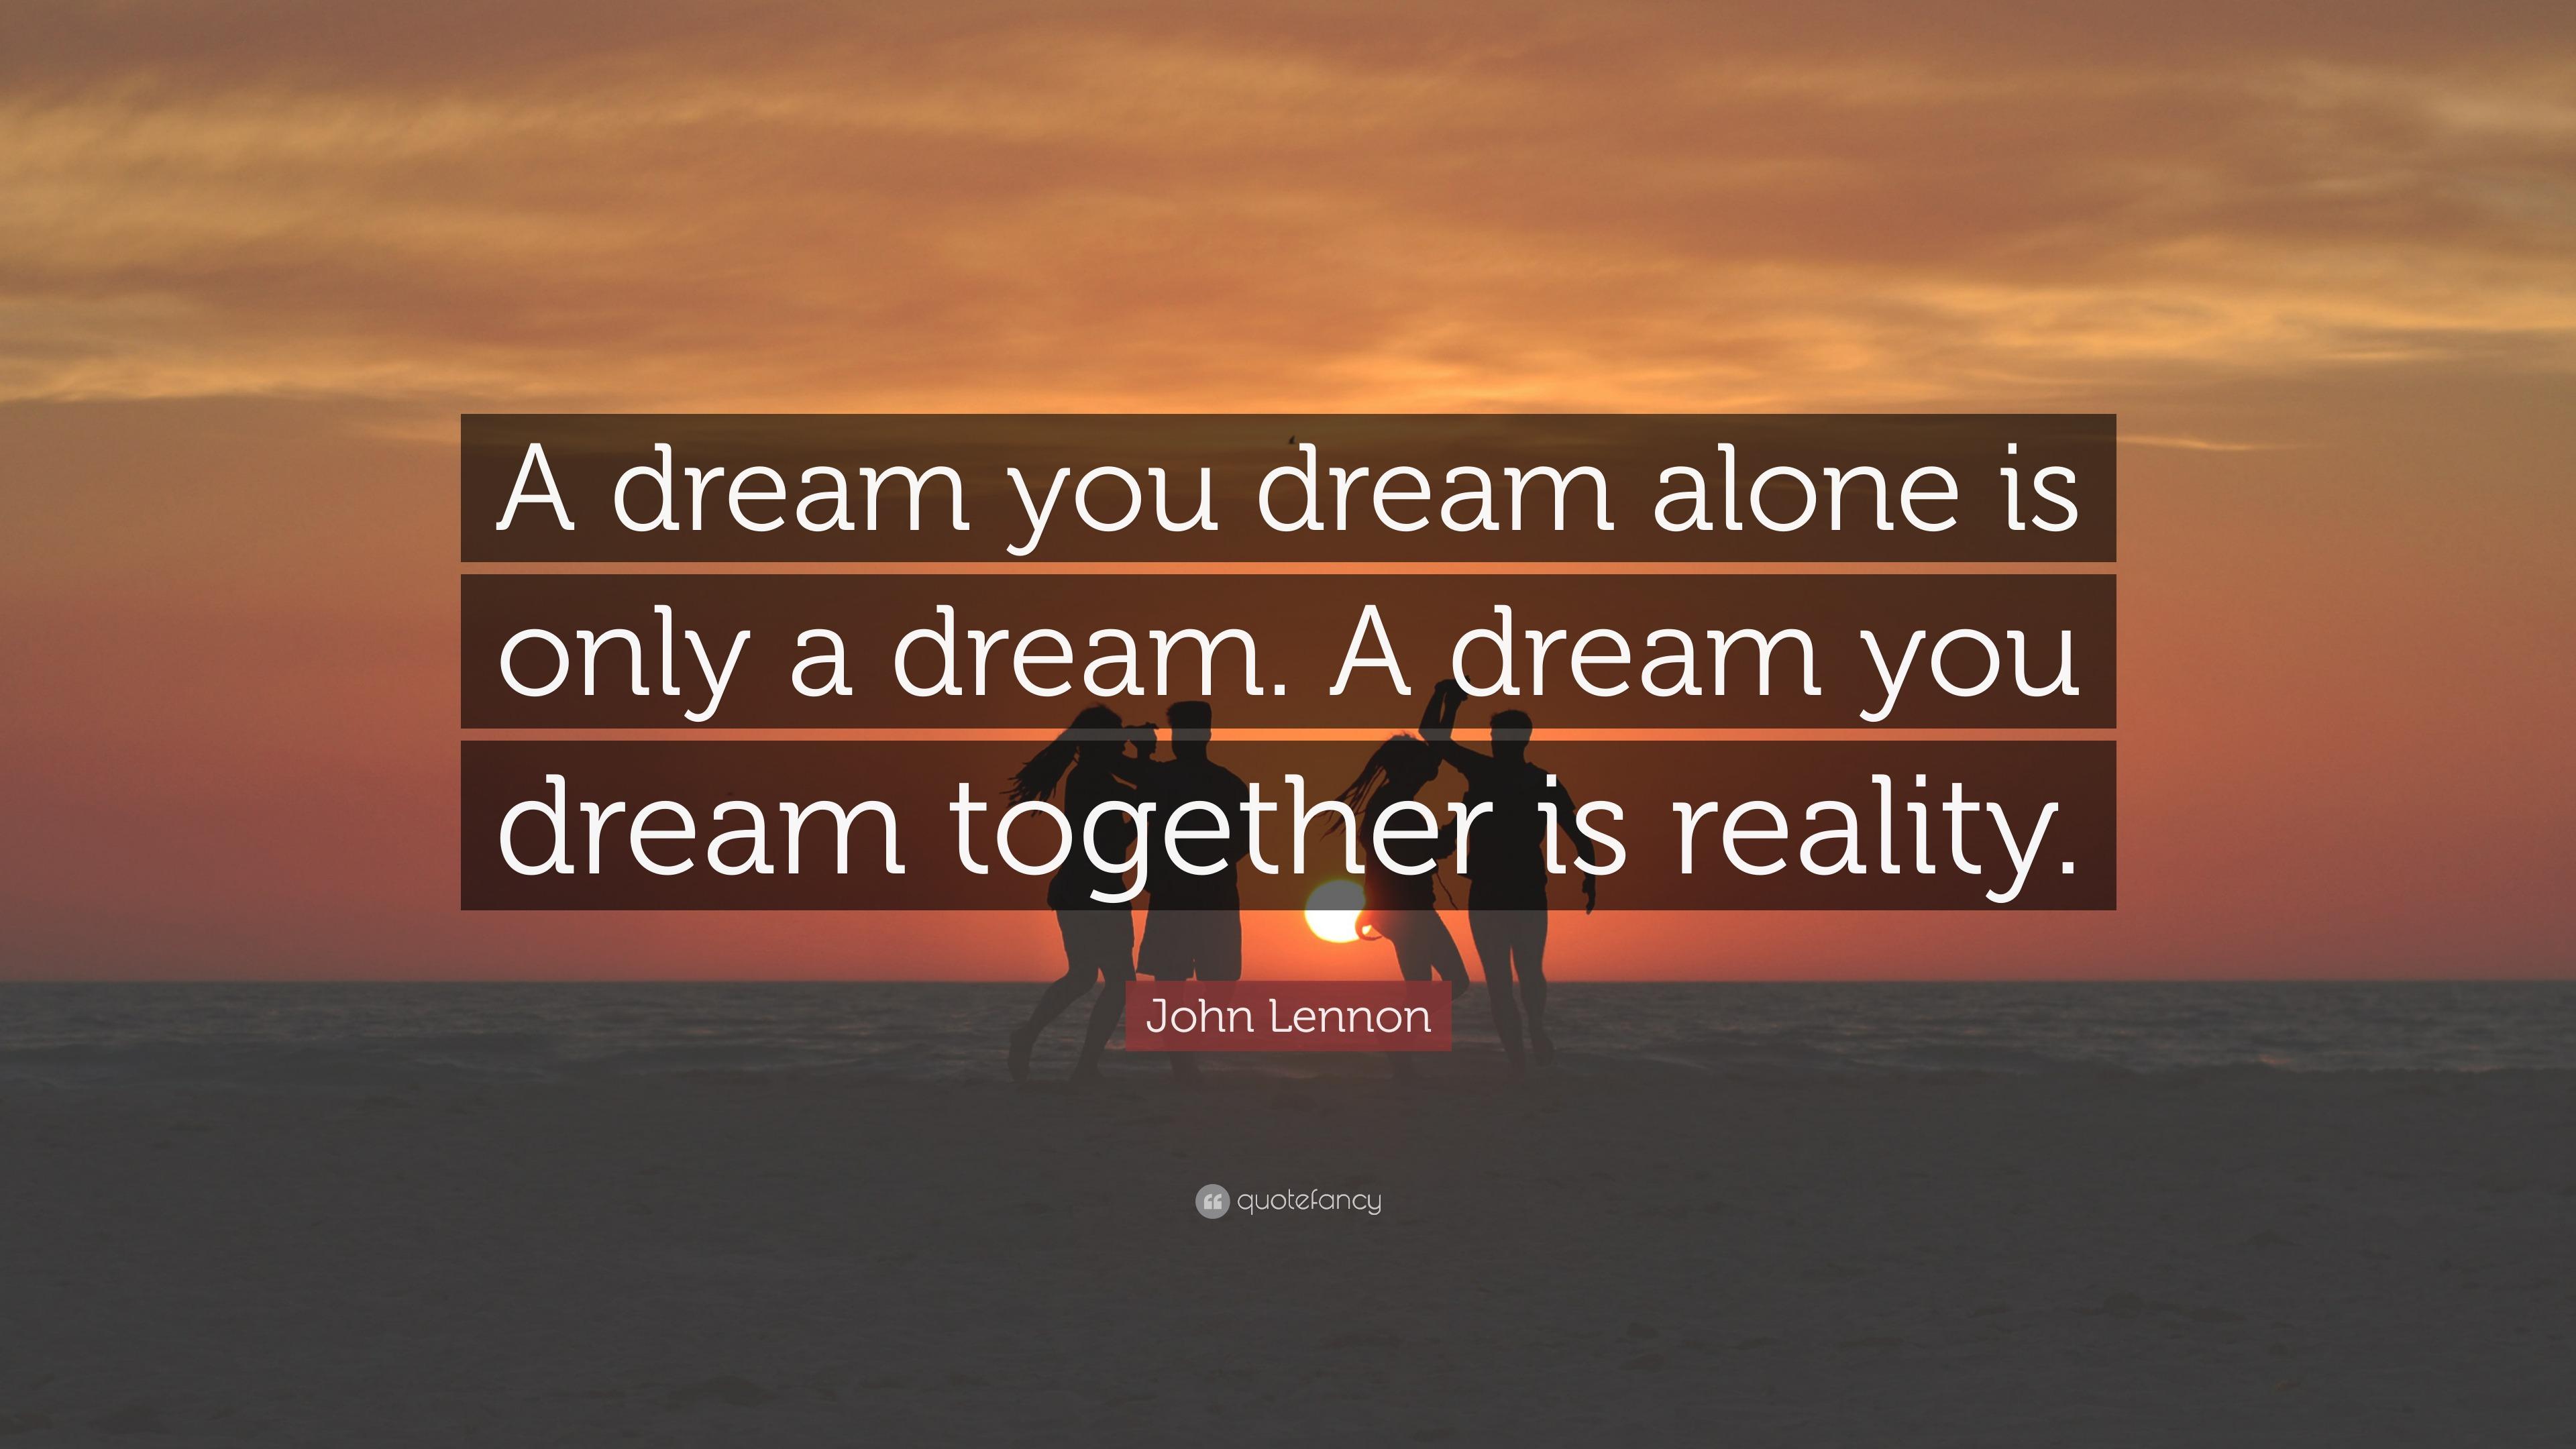 John Lennon Quote A Dream You Dream Alone Is Only A Dream A Dream